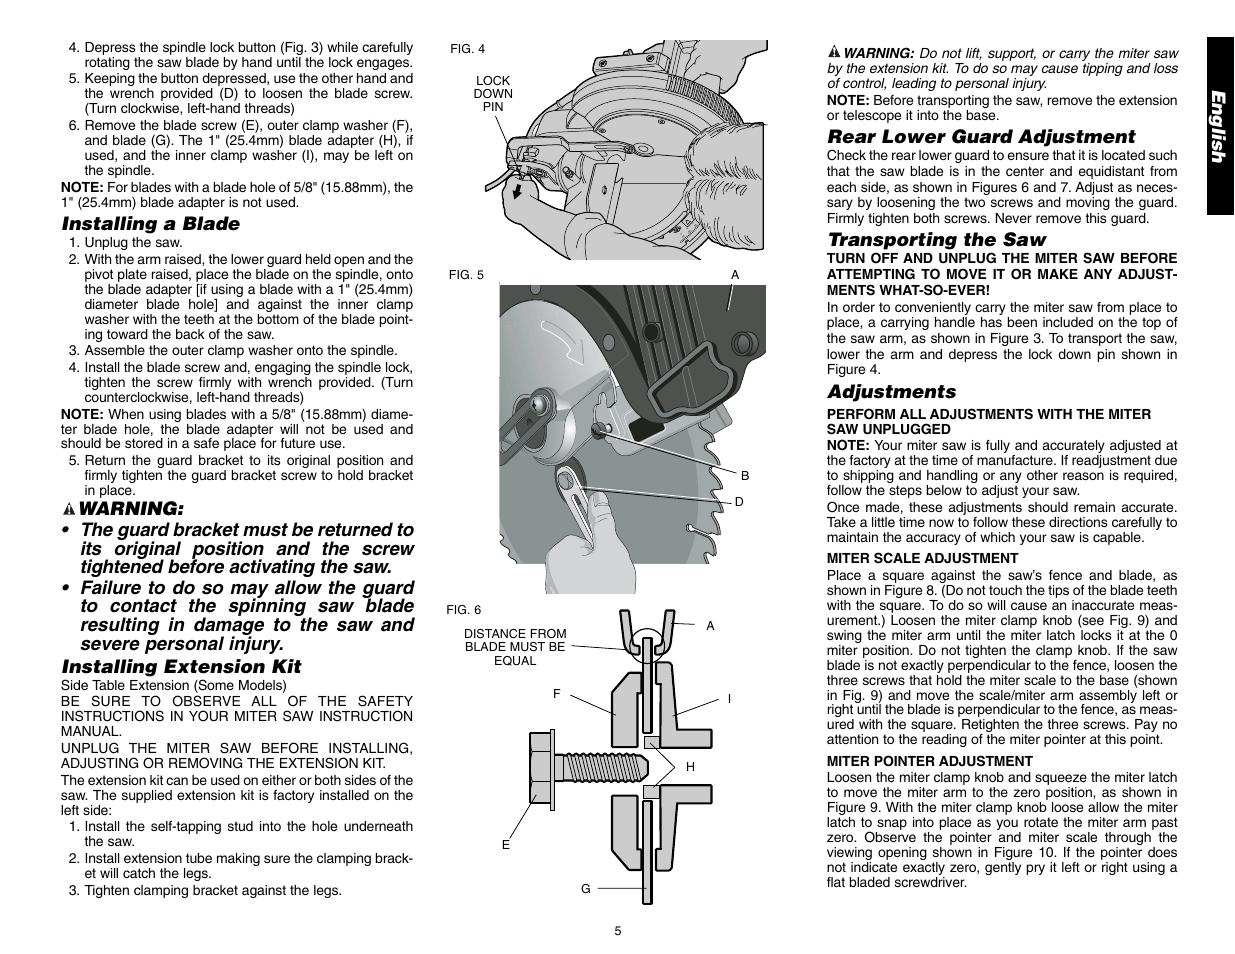 Dewalt 12 Compound Miter Saw Dw705 User Manual Page 7 52